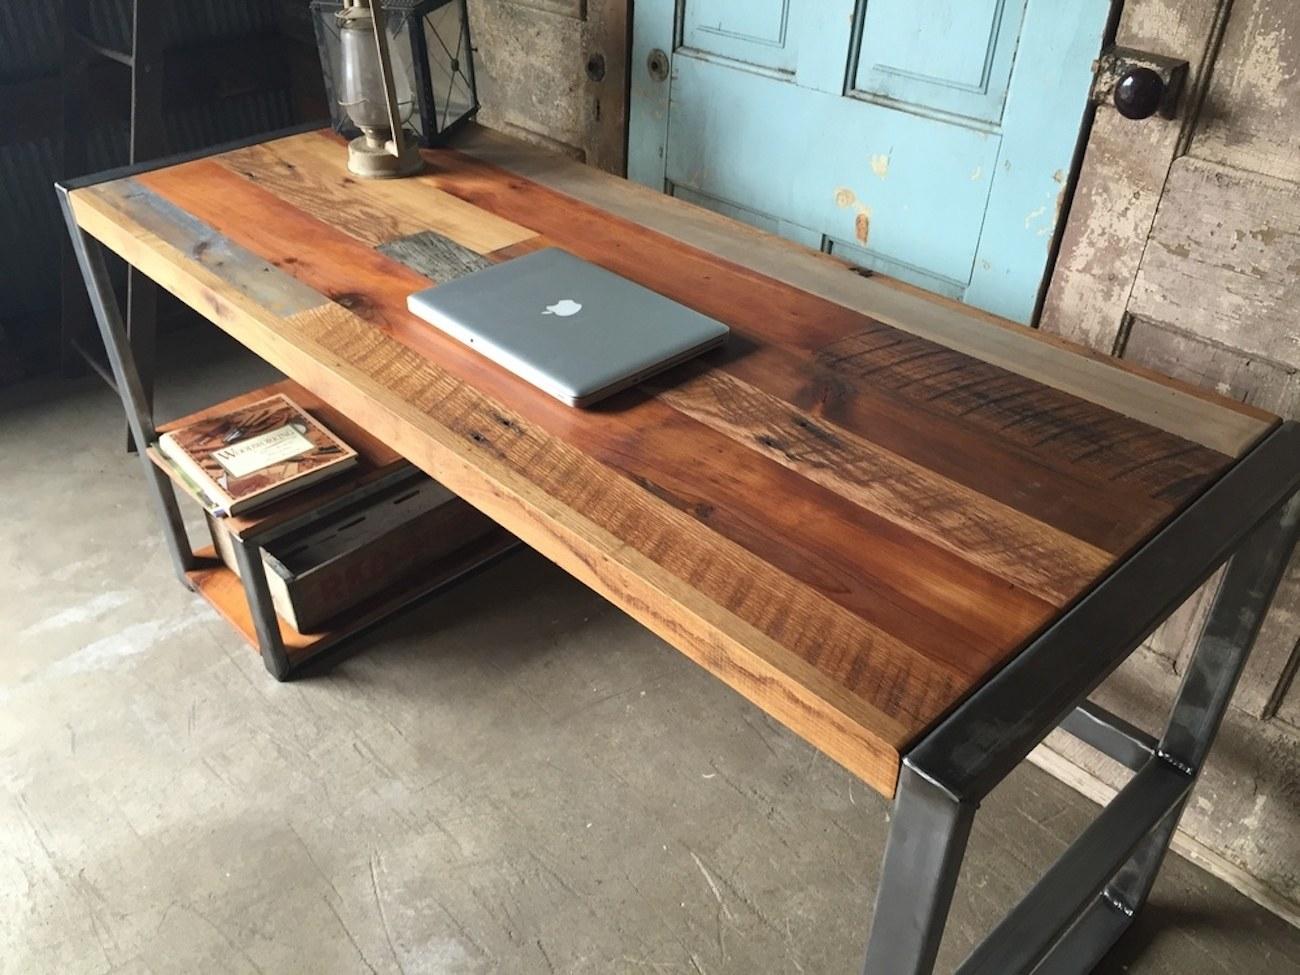 Reclaimed Wood Patchwork Desk  Gadget Flow